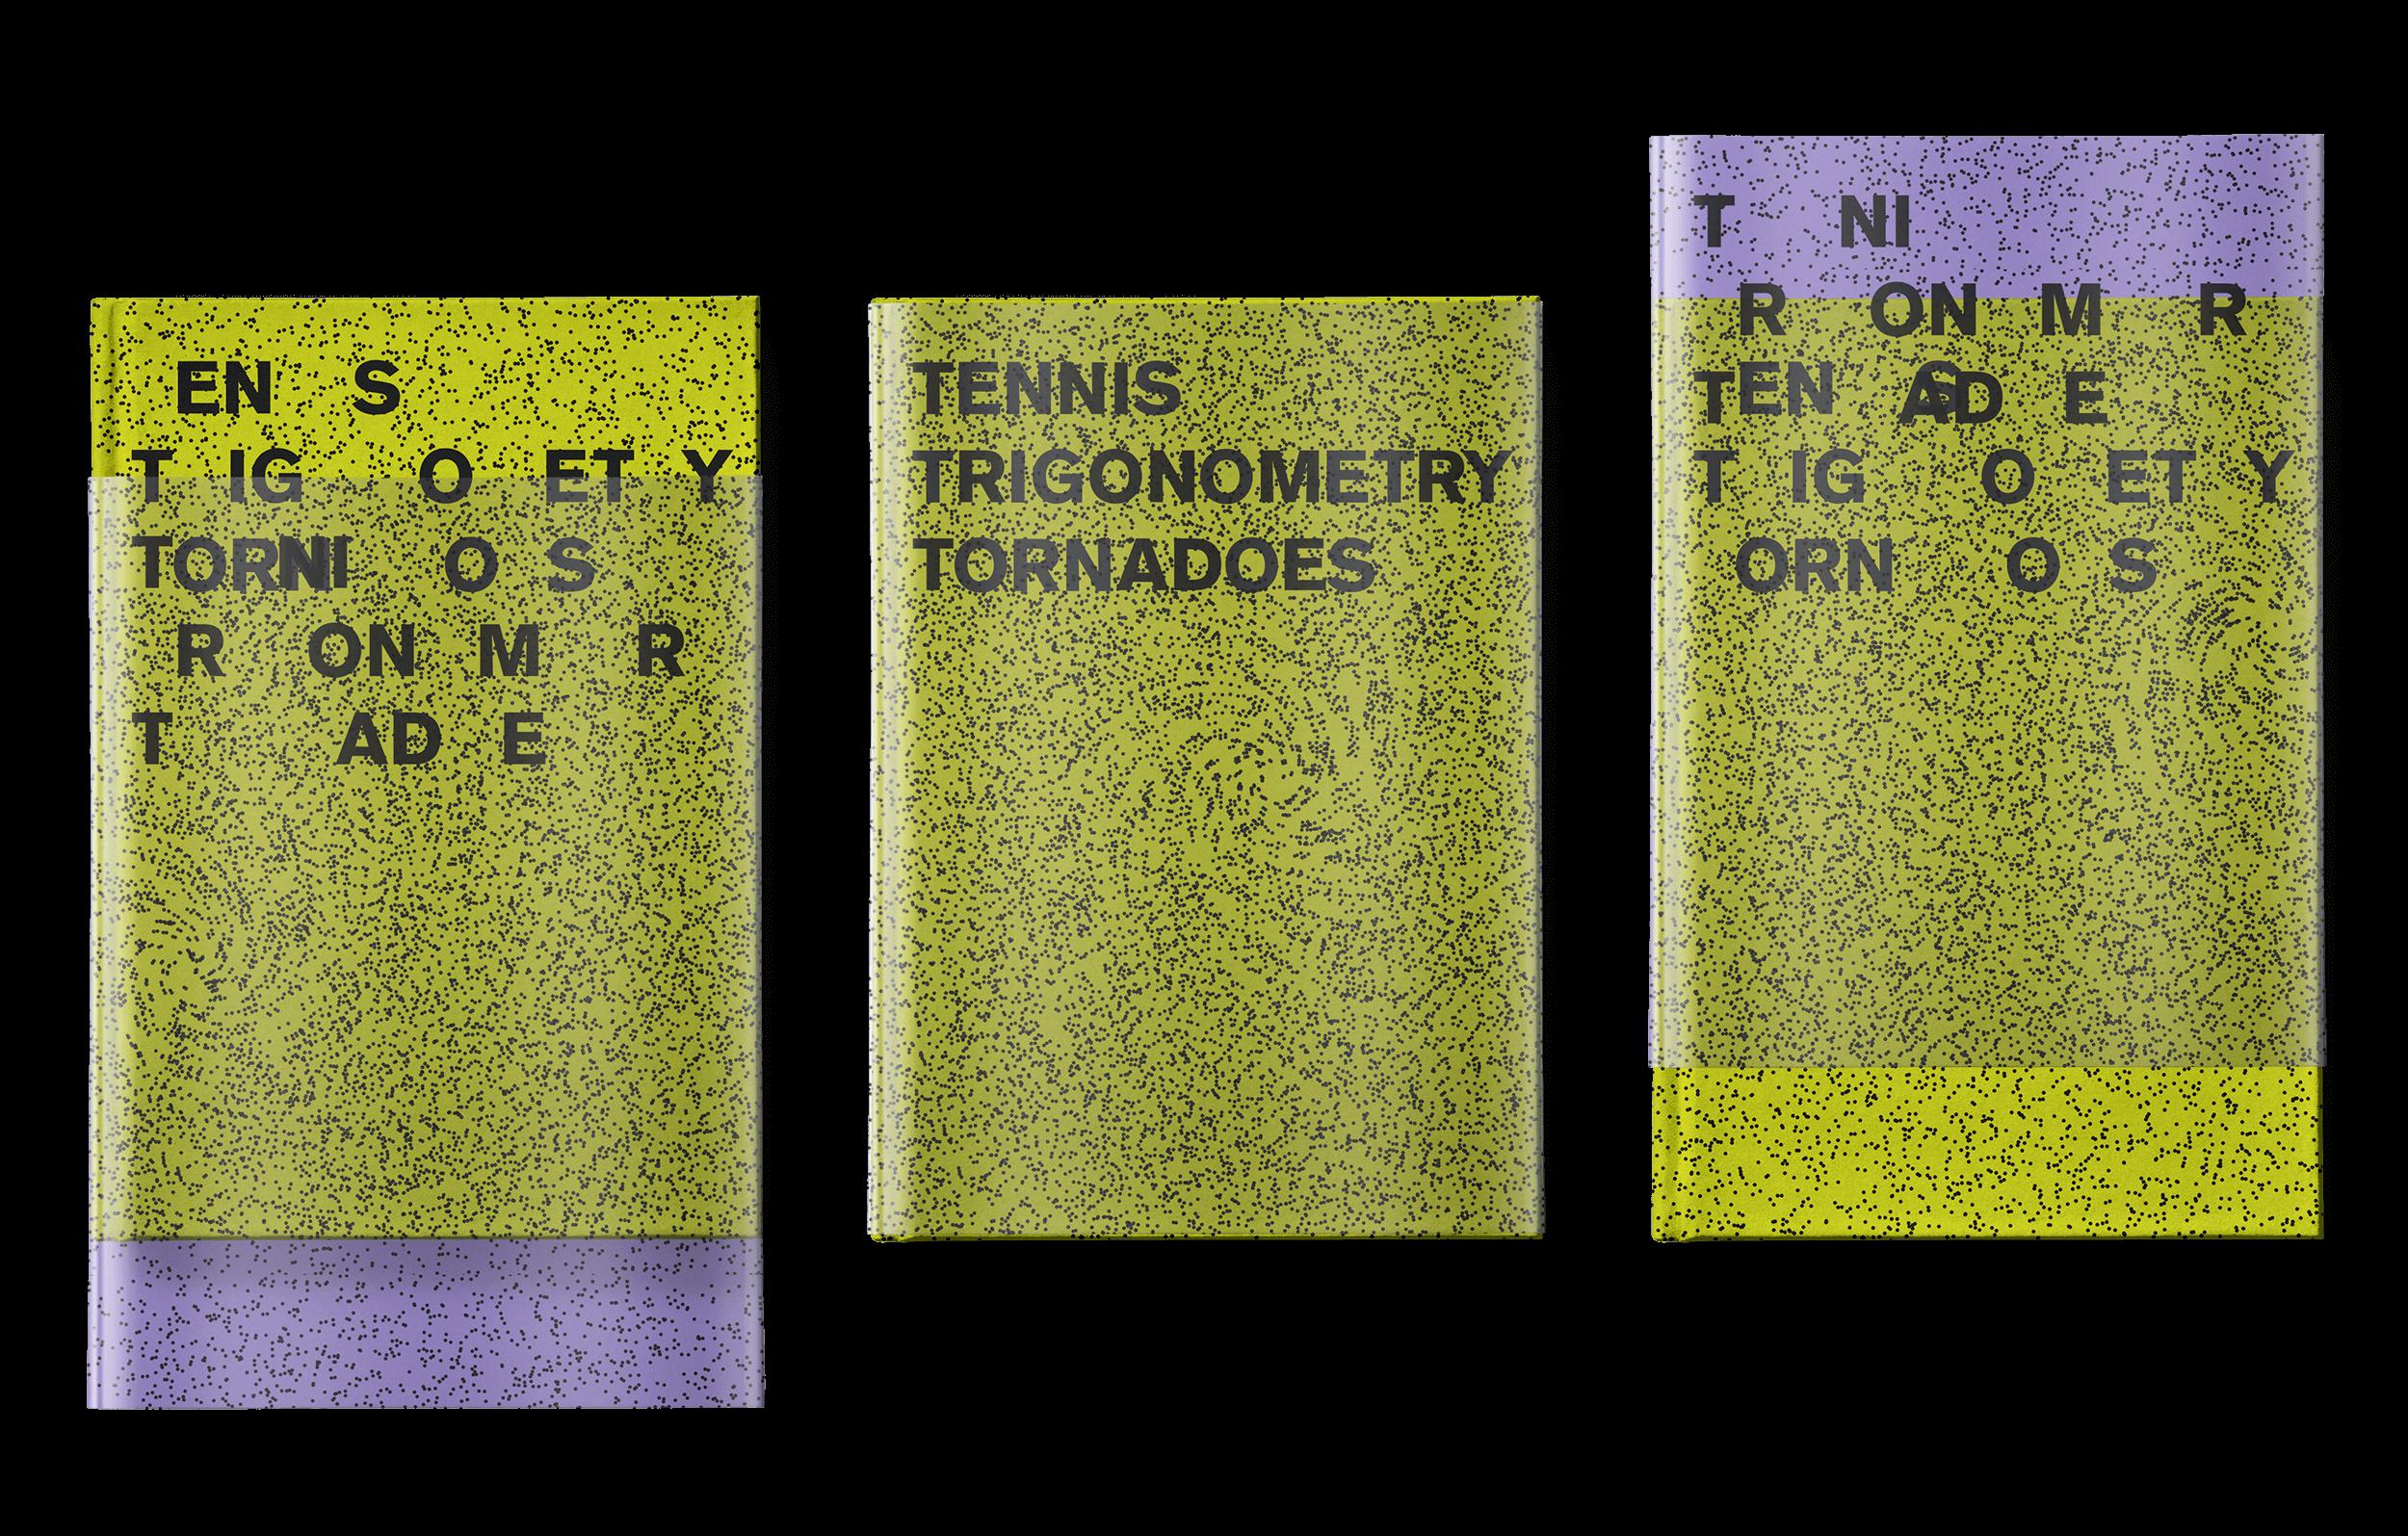 axel_lindmarker_tennis_trigonometry_tornadoes_1